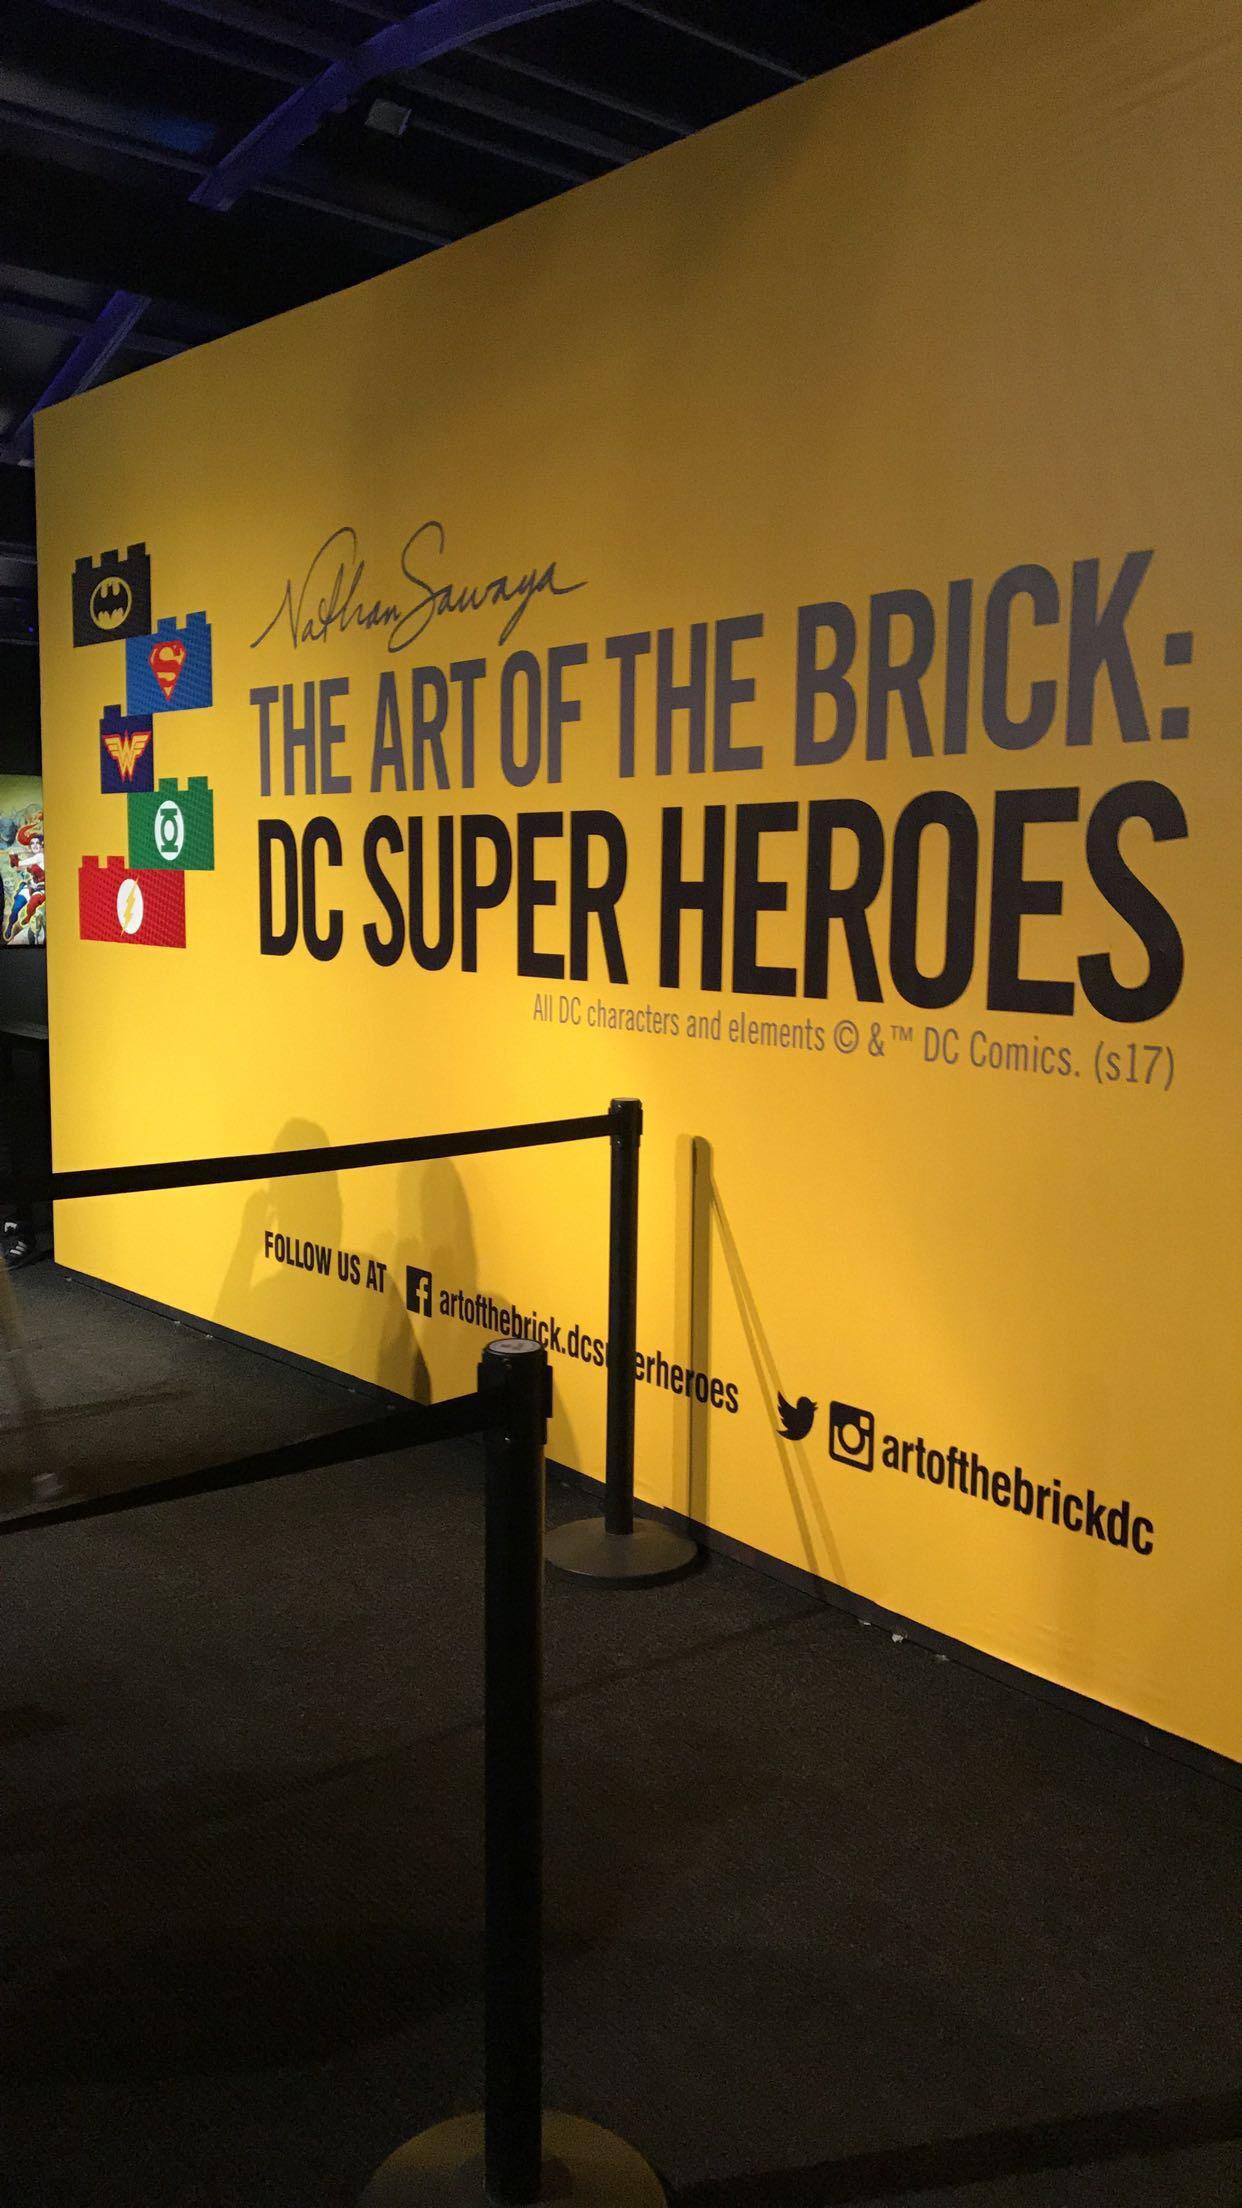 The Art of the Brick DC Super Heroes | Lifeparenthoodfamily.co.uk